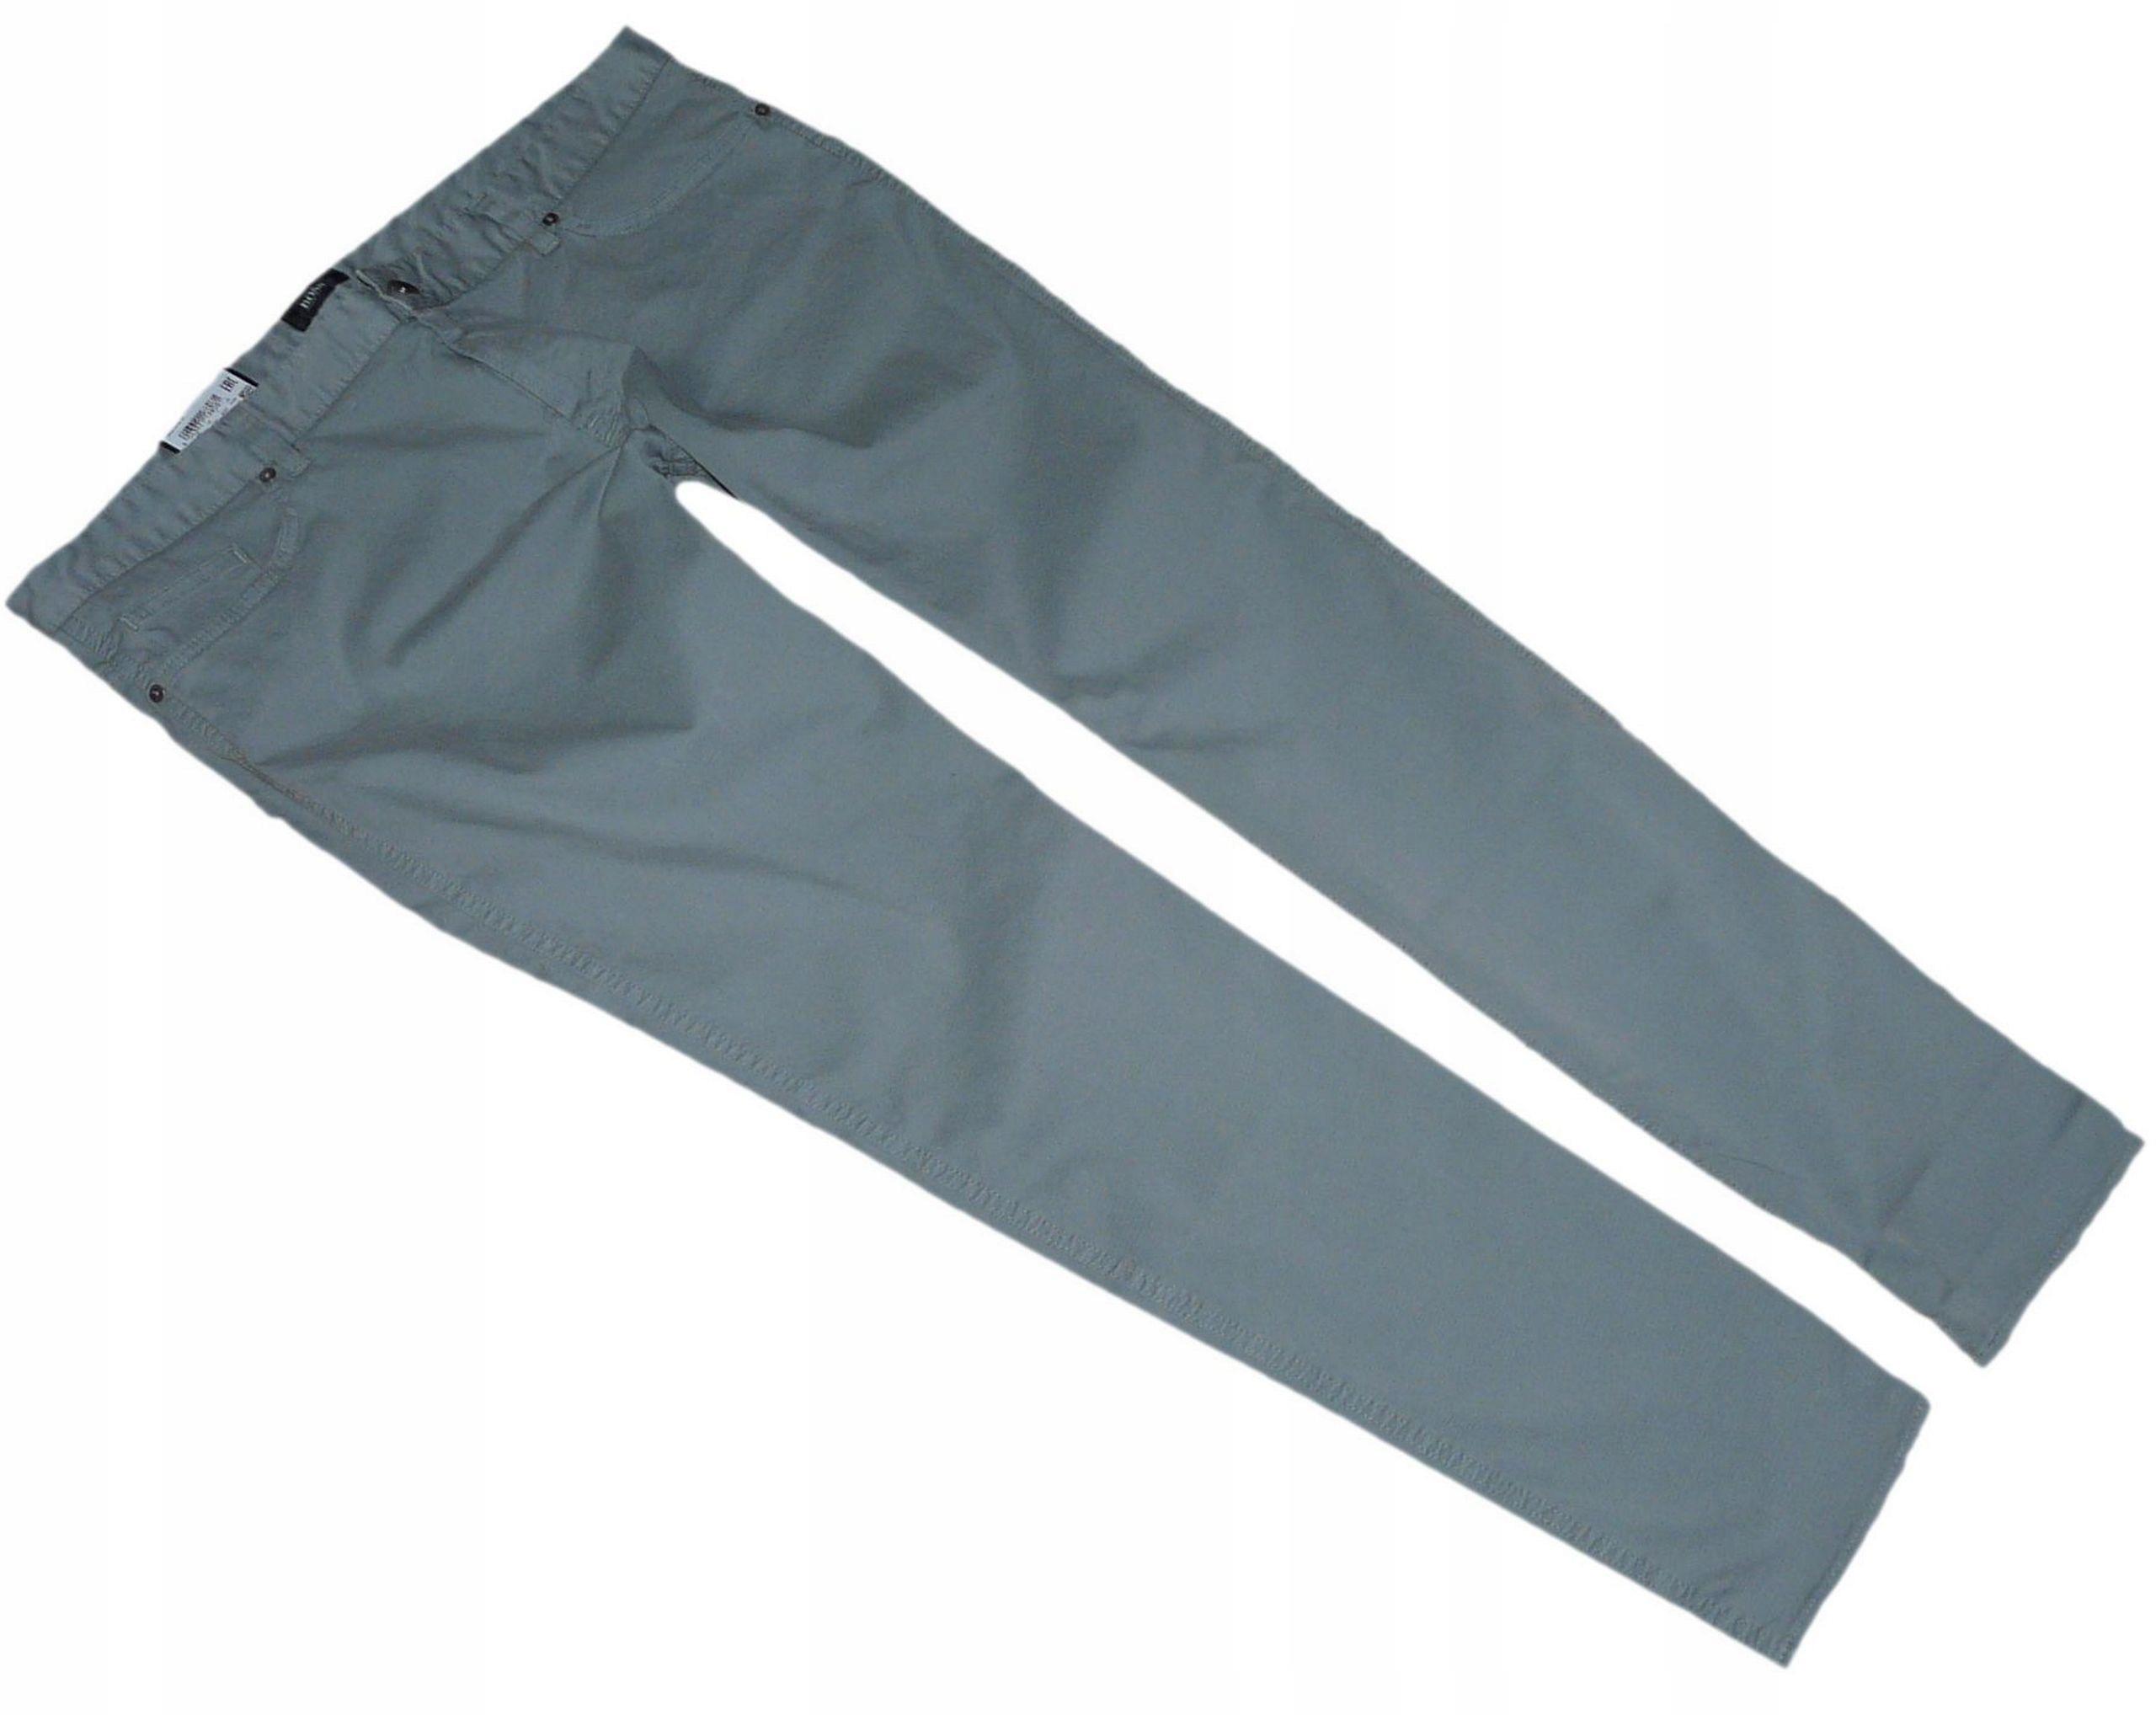 HUGO BOSS spodnie szare chinosy SLIM FIT W40L32